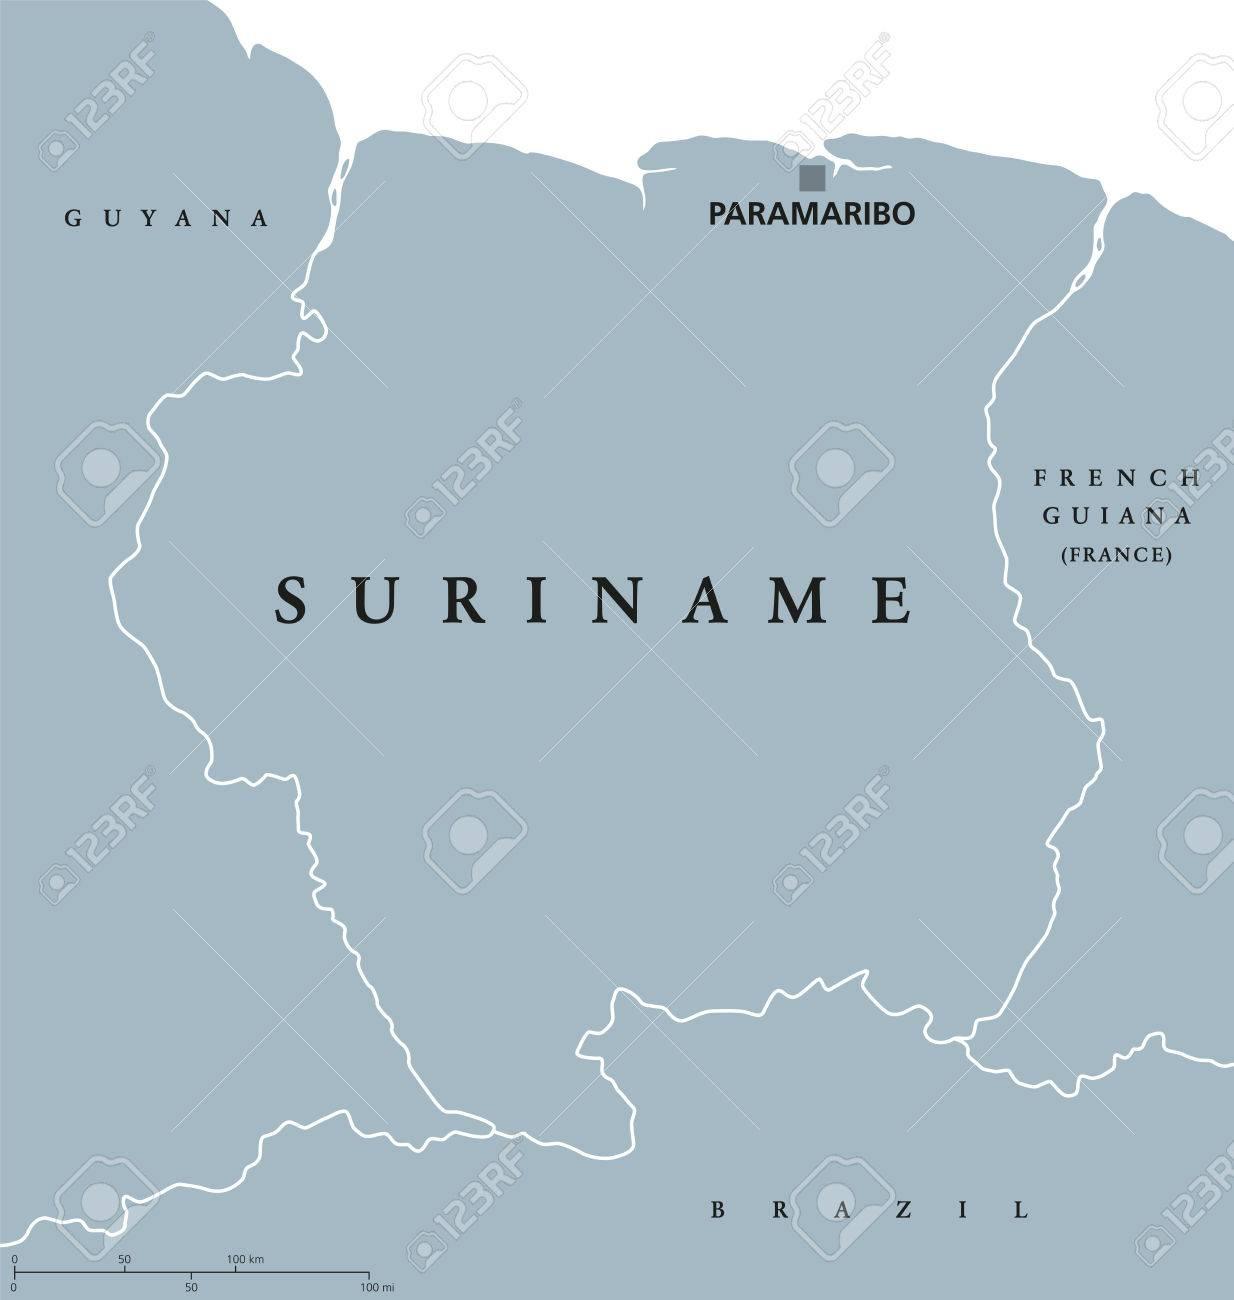 Suriname Political Map With Capital Paramaribo National Borders